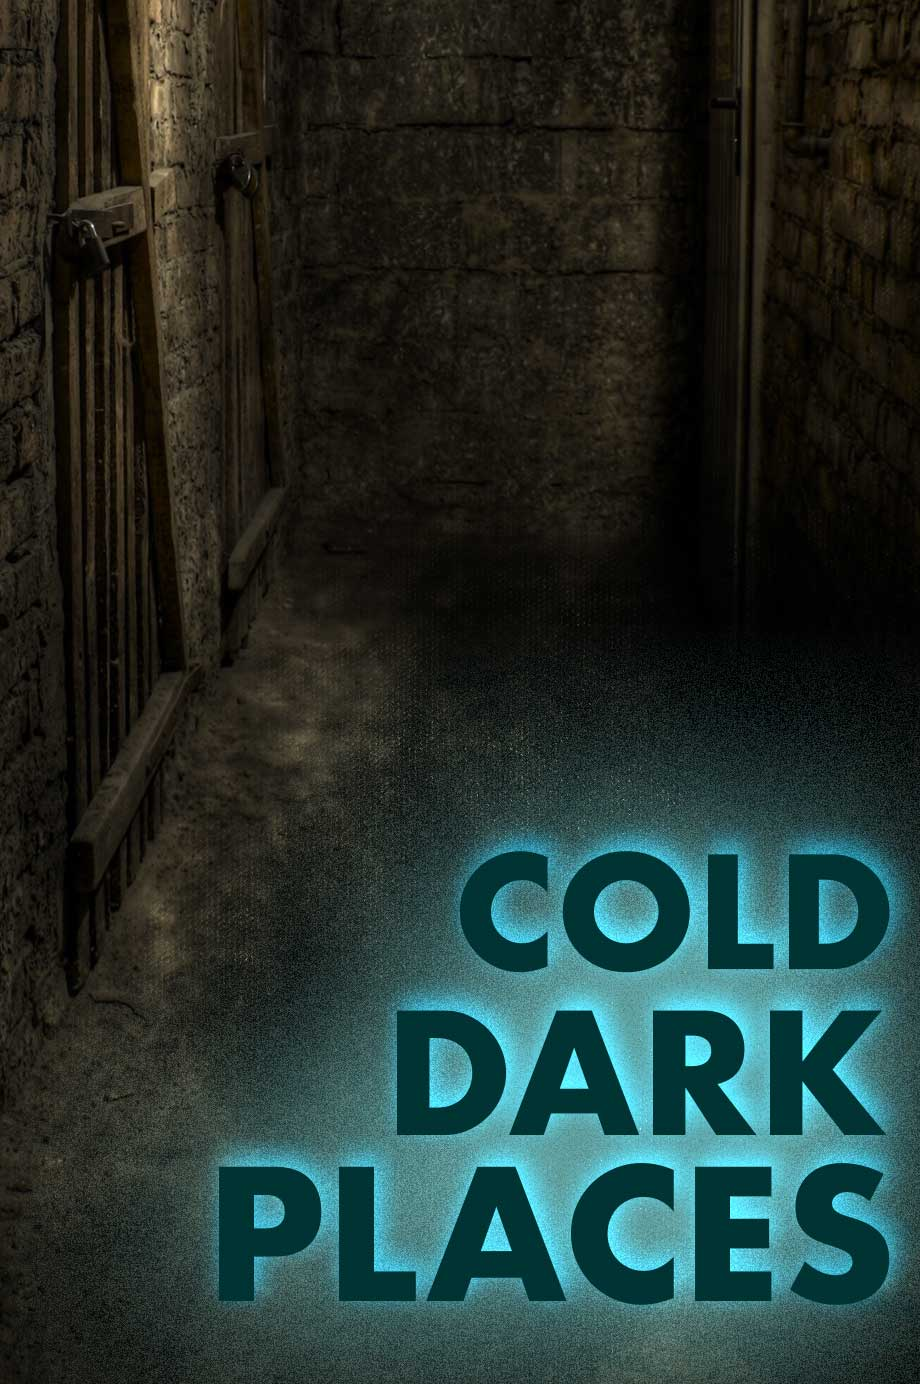 cold_dark_places-1